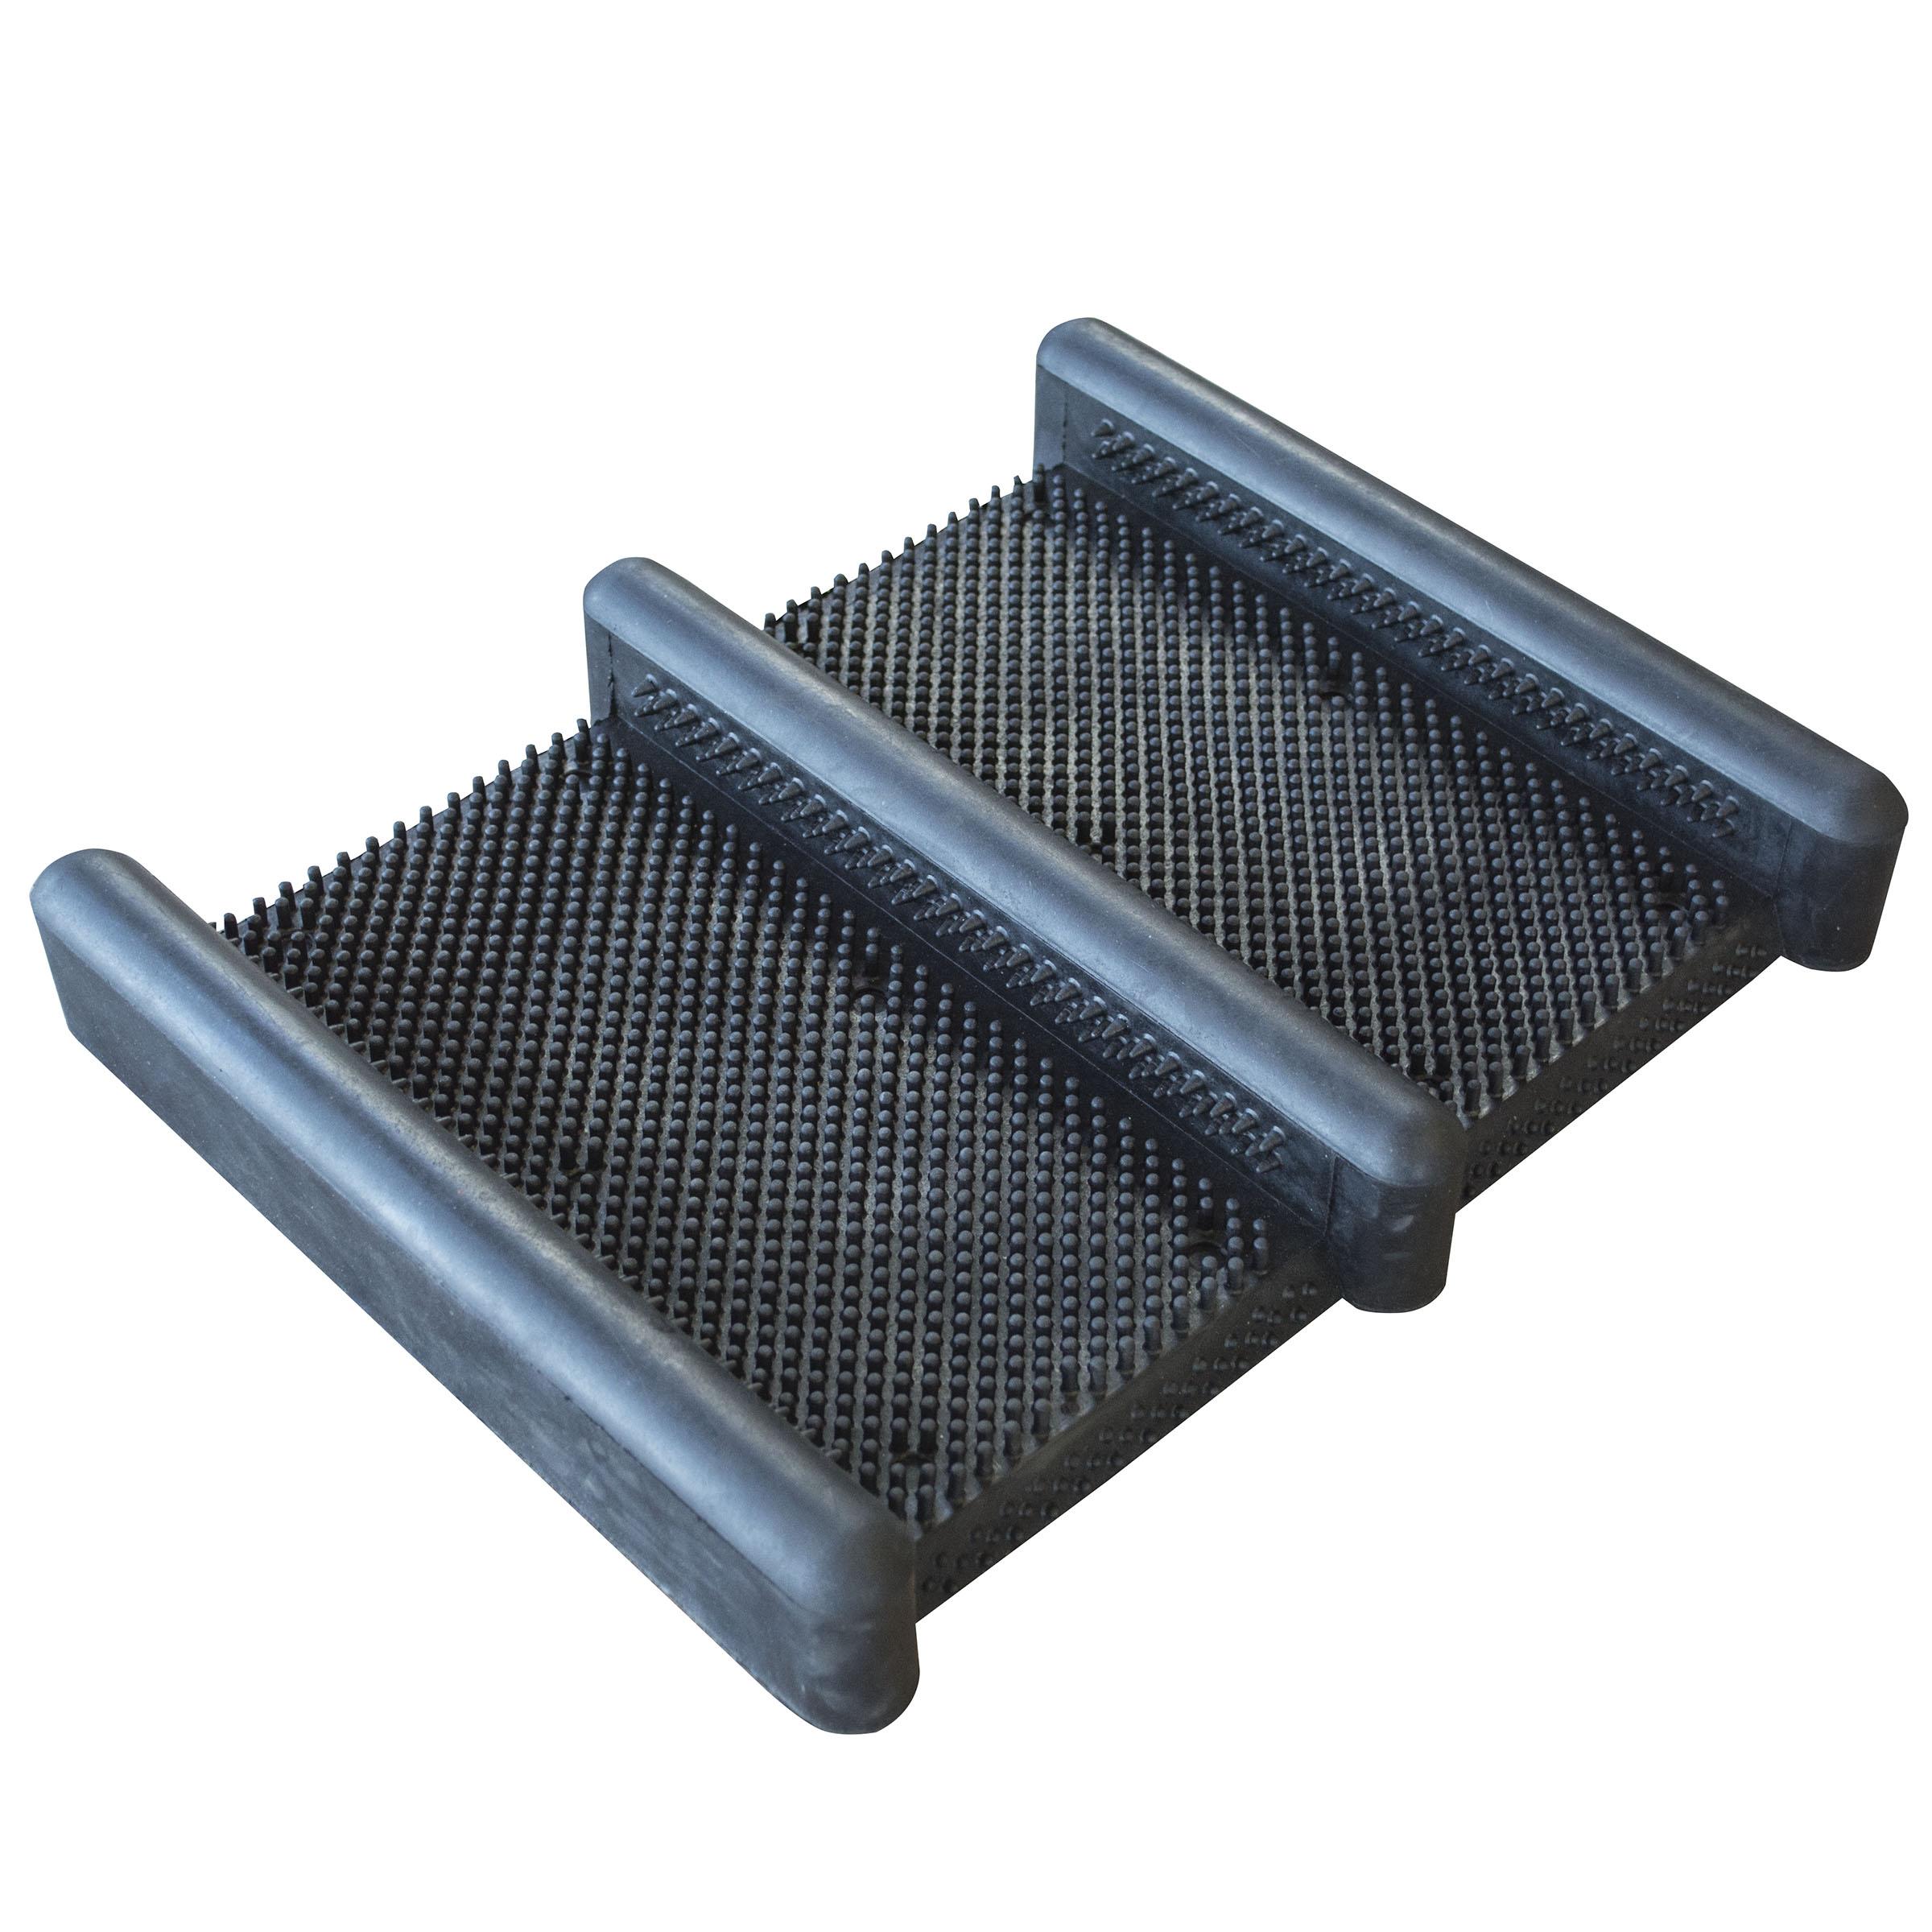 Rubber Boot Scraper Mat